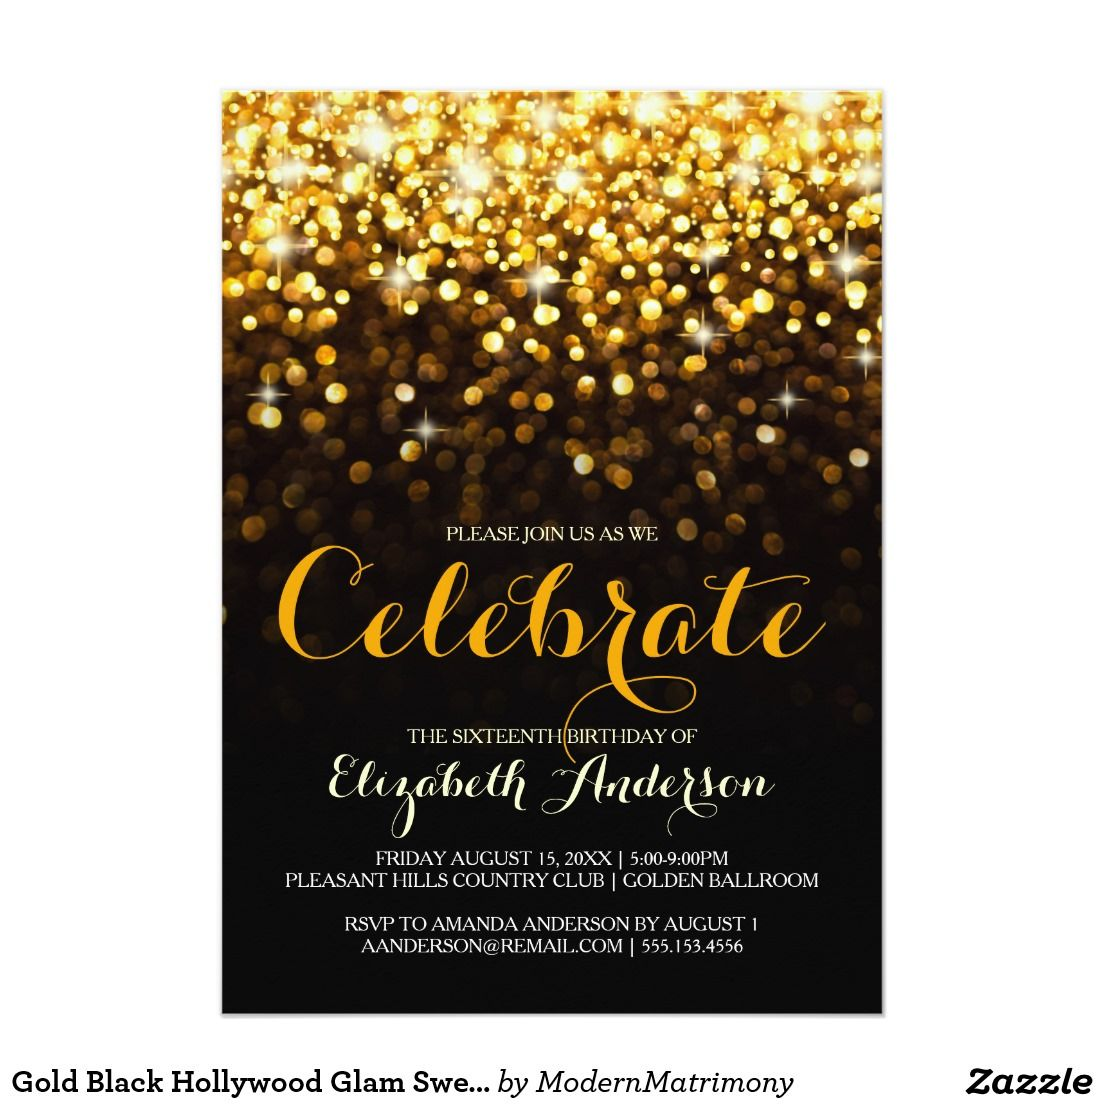 Gold Black Hollywood Glam Sweet Sixteen Invitation   SWEET SIXTEEN ...